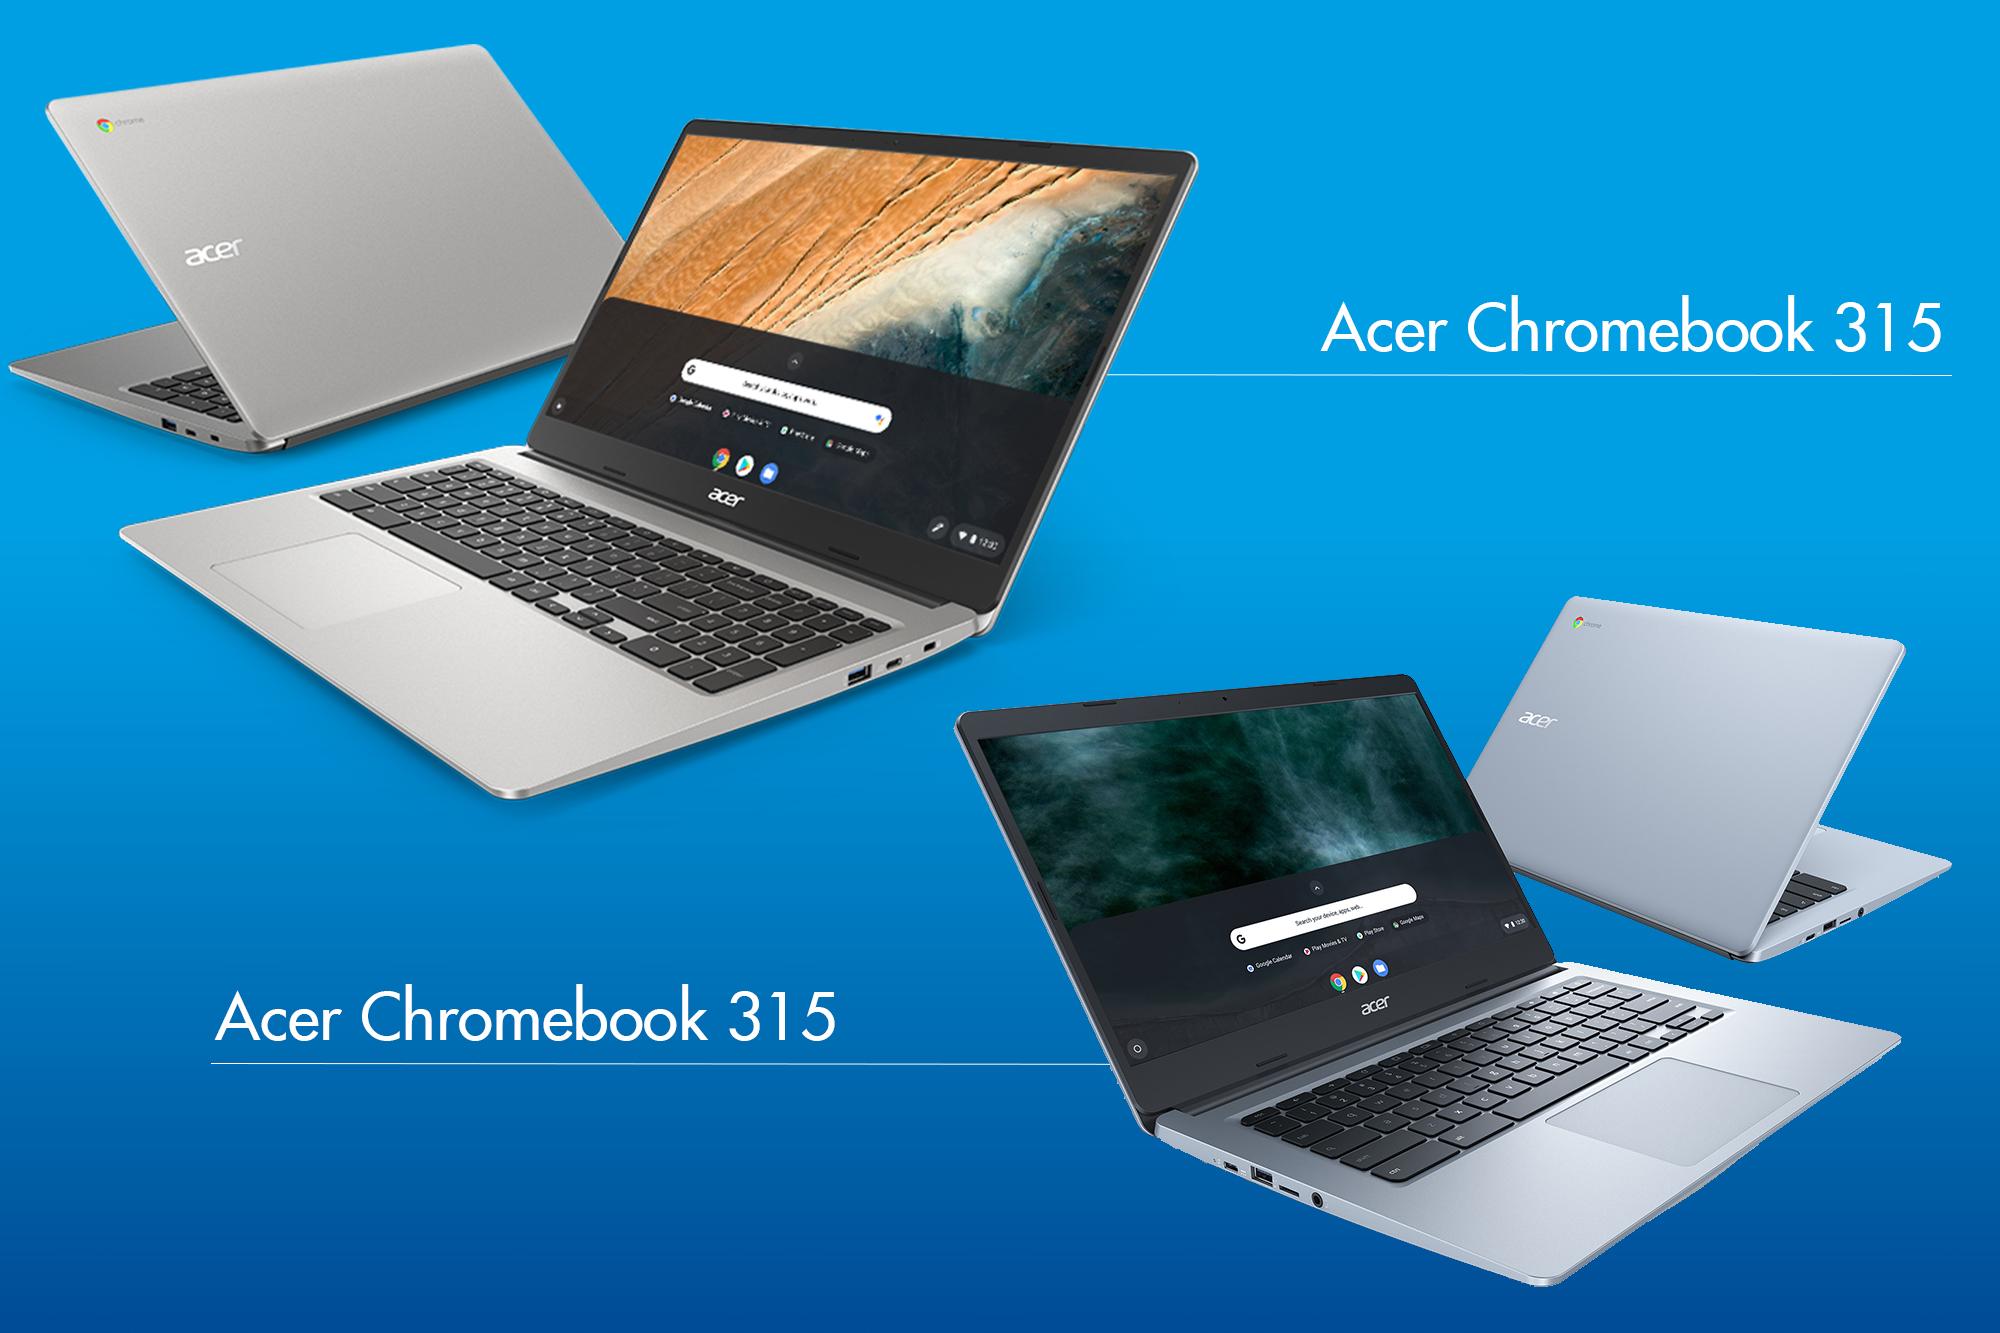 Acer Chromebook 315 & Chromebook 314